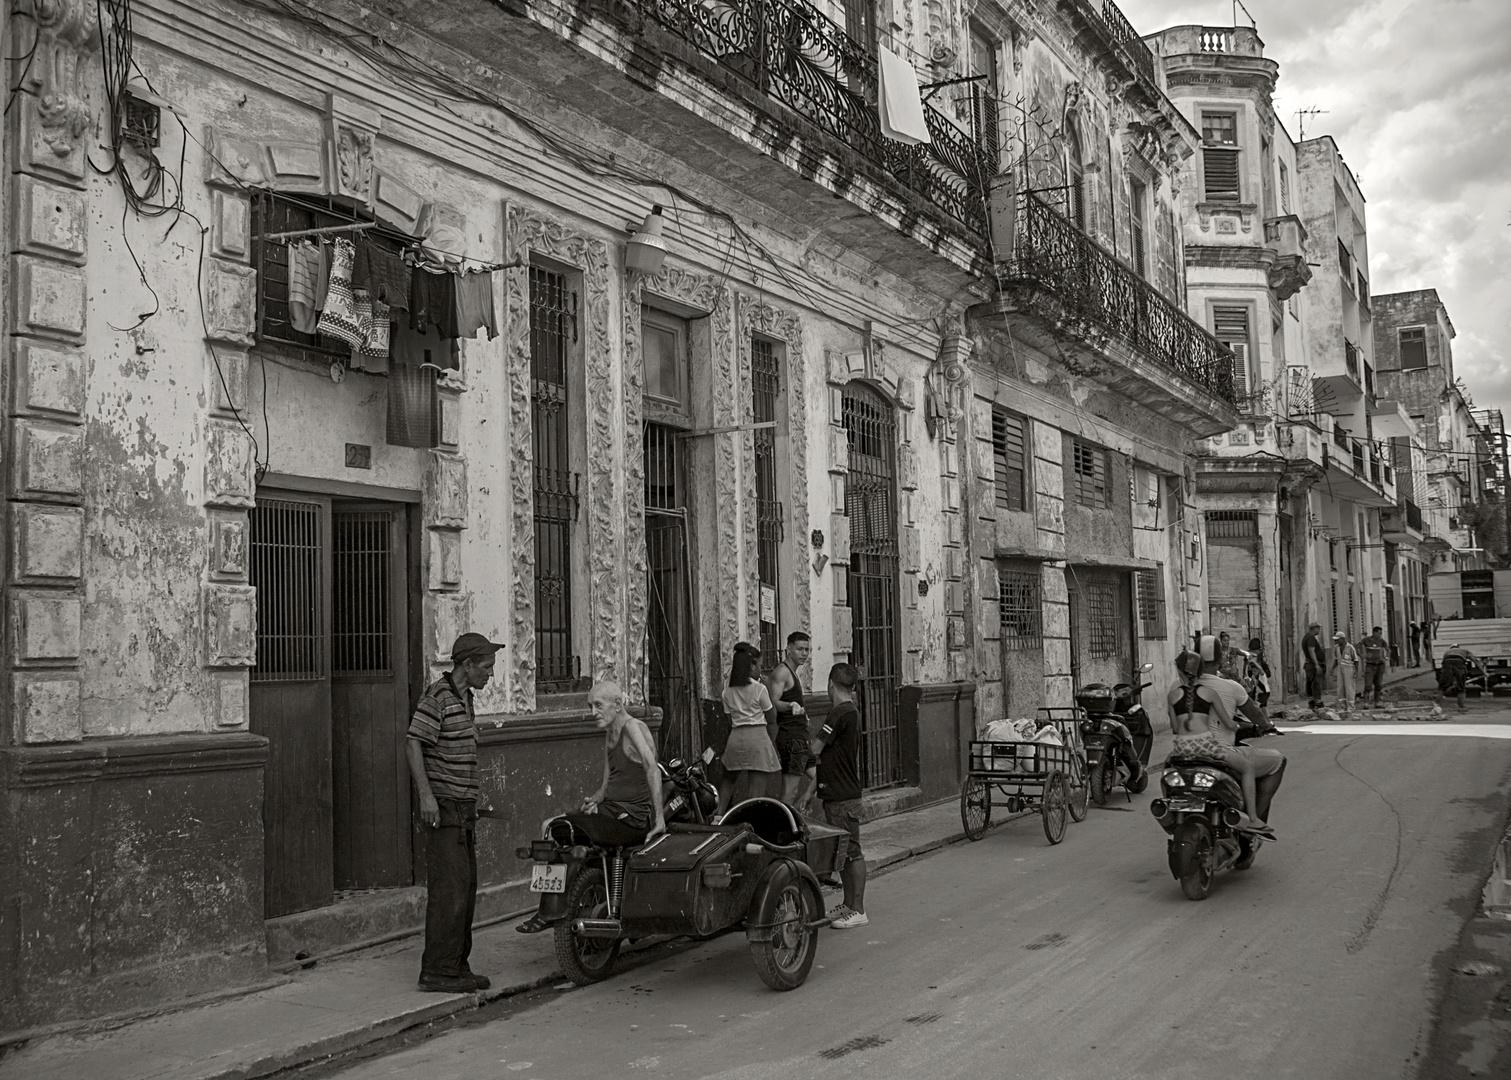 Life goes on in Habana Vieja